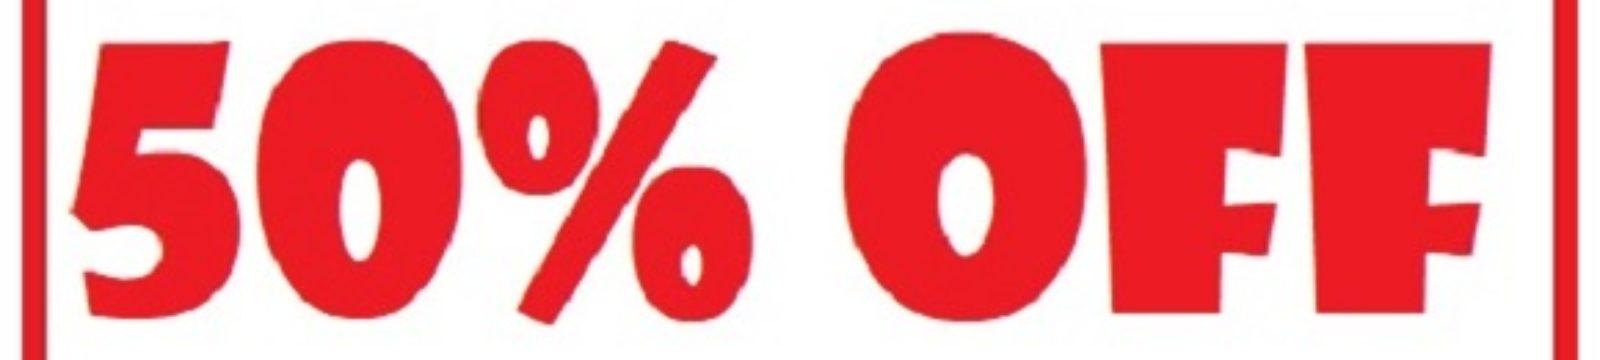 Logo depicting 50 percent off flight prices